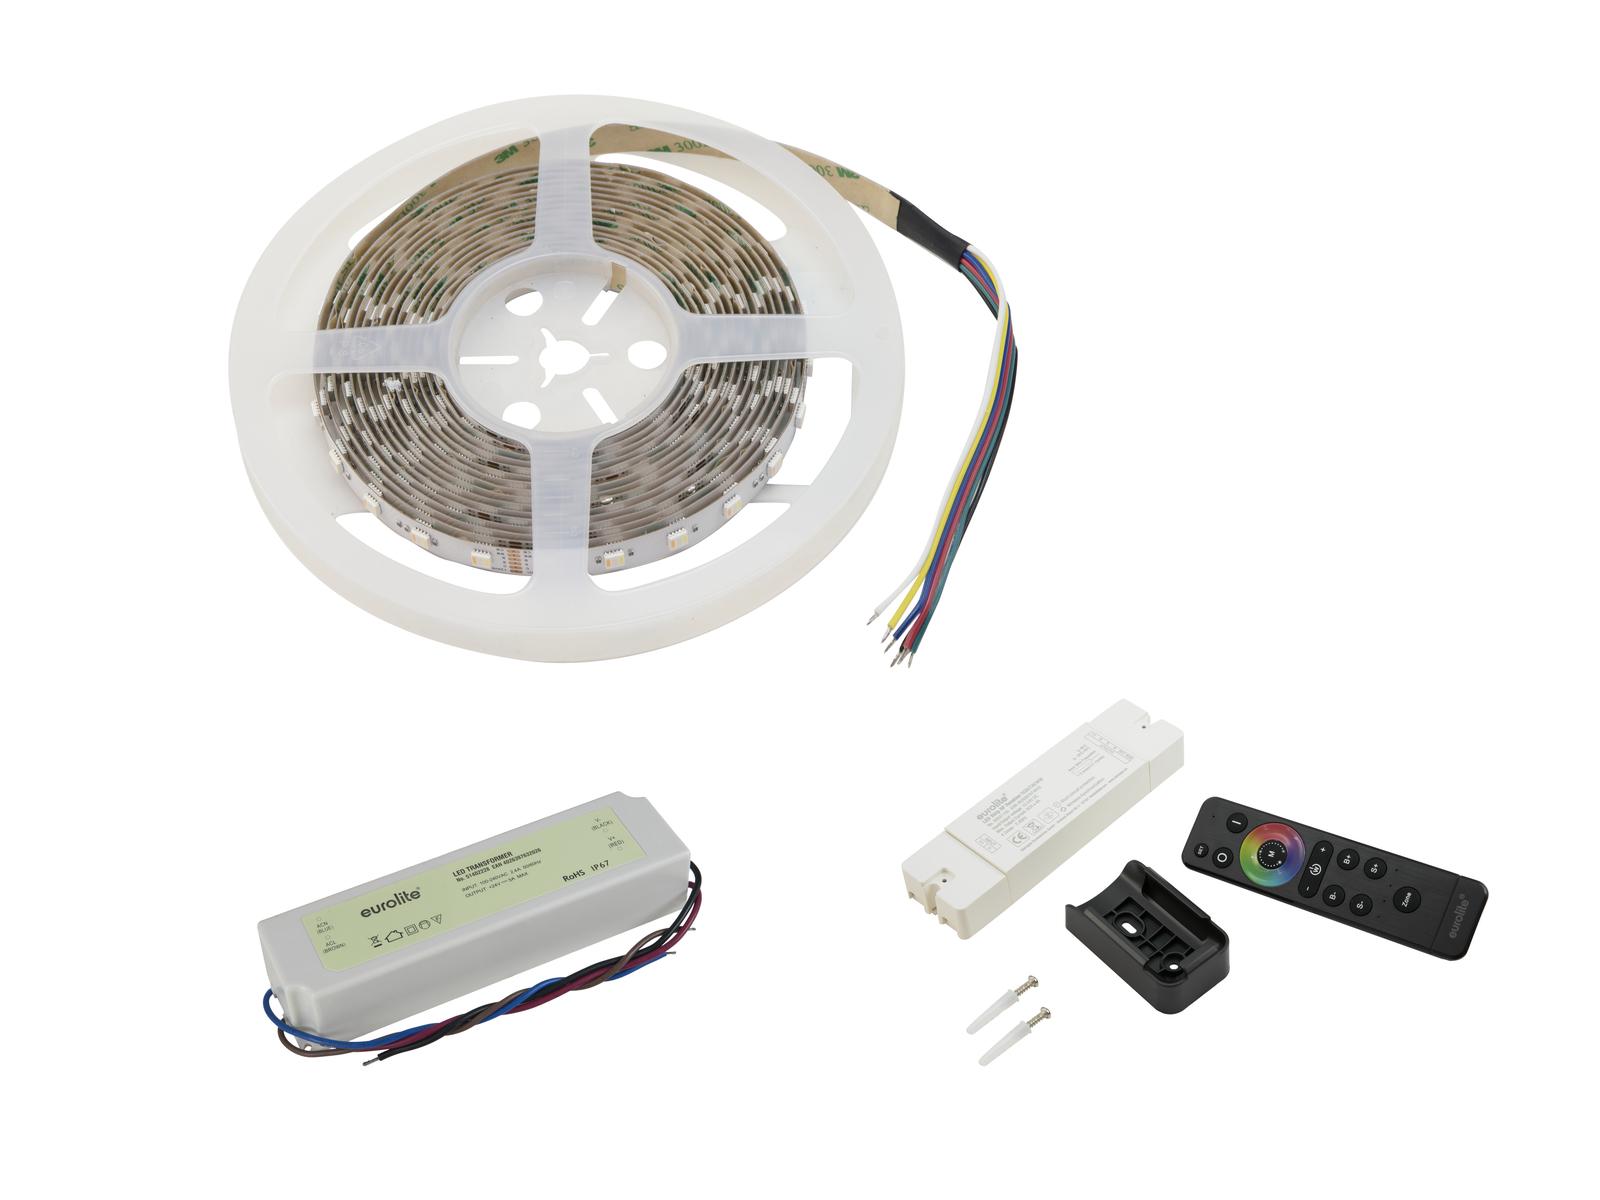 EUROLITE Set LED Strip 300 5m 5050 RGB/WW/CW + RF Controller + Trafo 24V